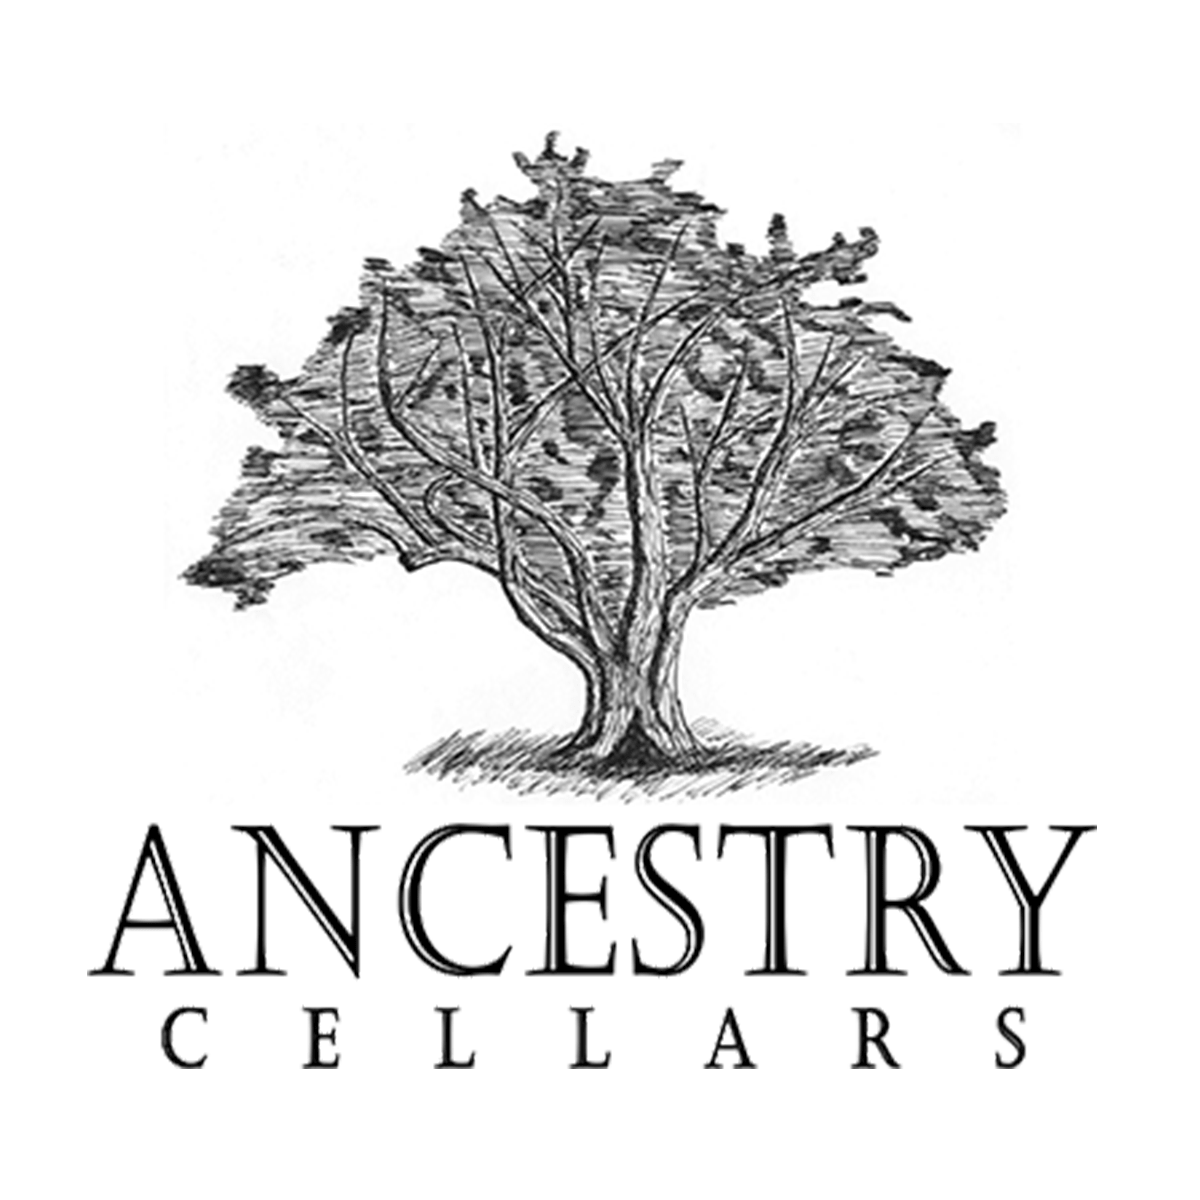 Ancestry Cellars logo